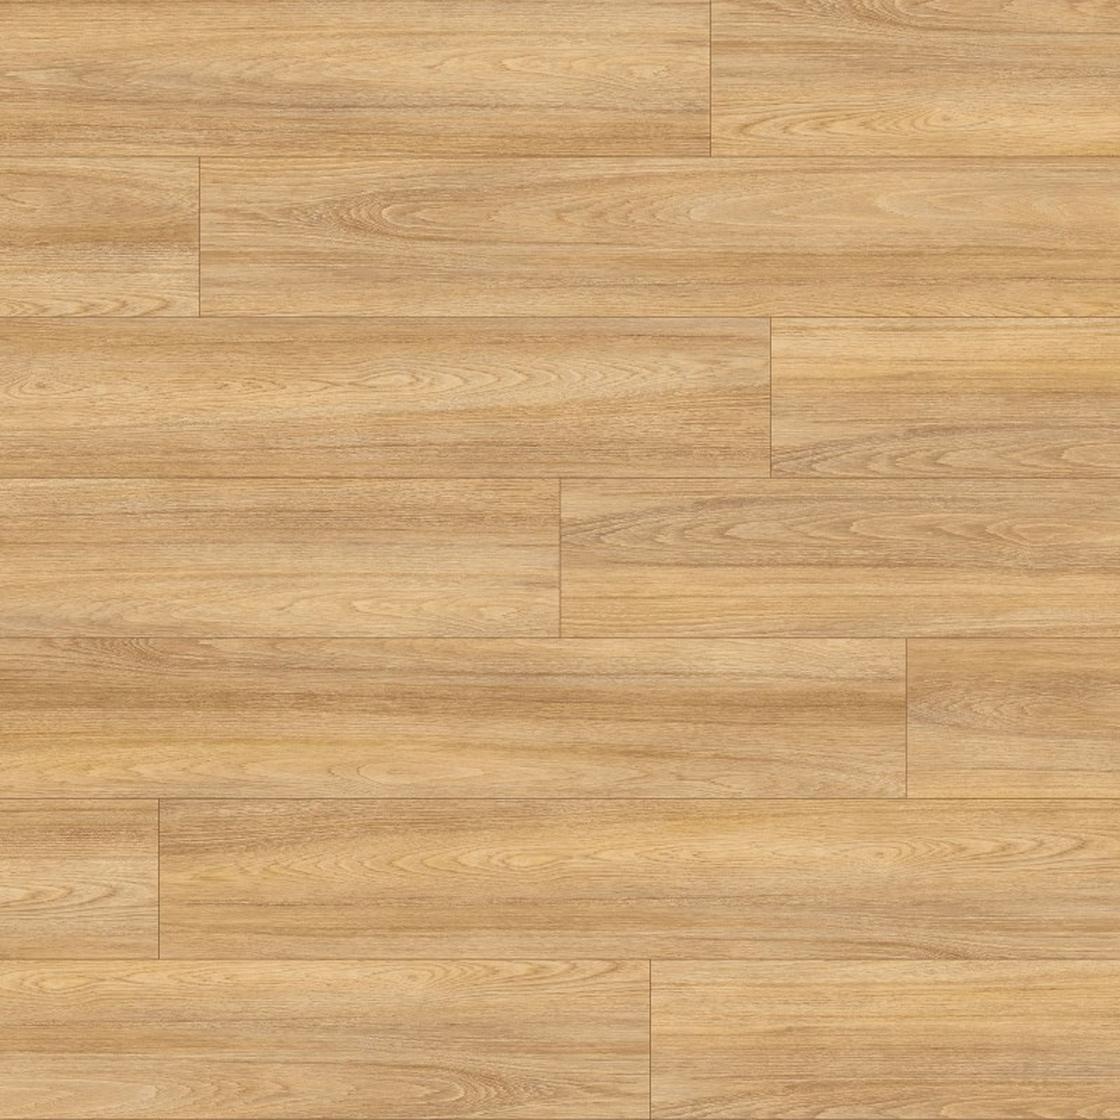 Dlw Flooring Naturecore Classic Ash Light 1130 140 Bioboden Gunstig Kaufen